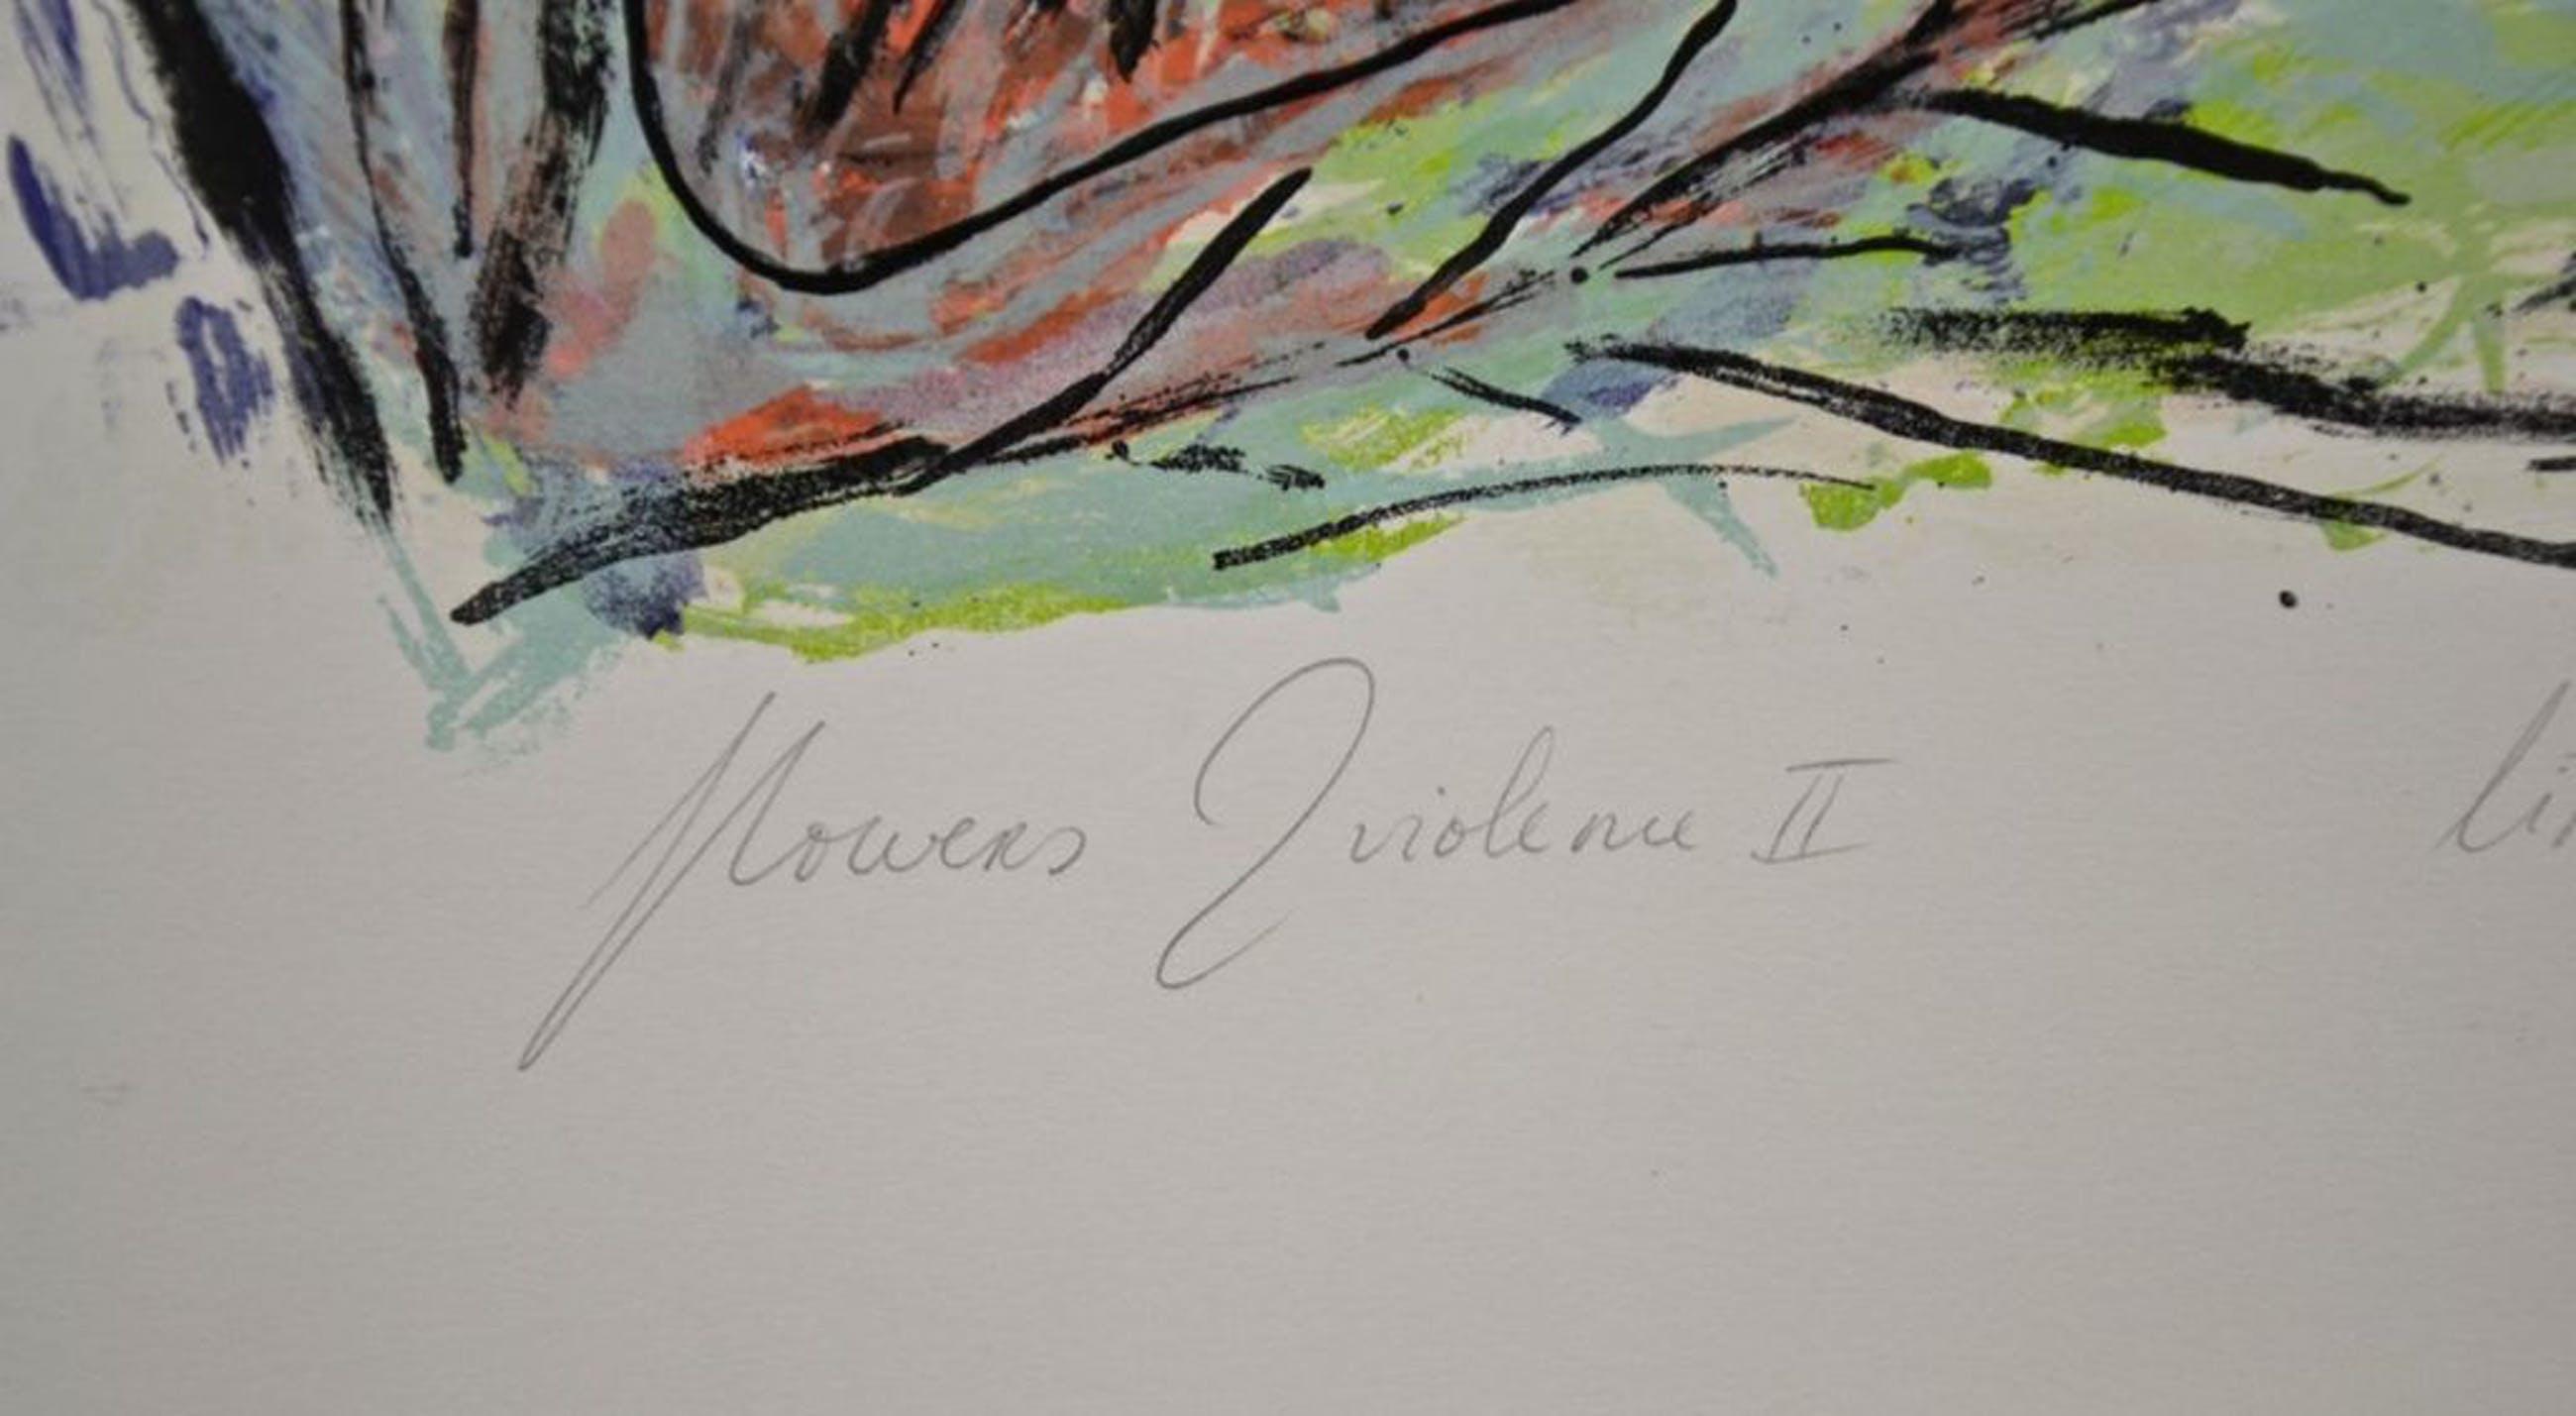 Anne-Marie Hoeven: Litho. Flowers & Violence II kopen? Bied vanaf 1!